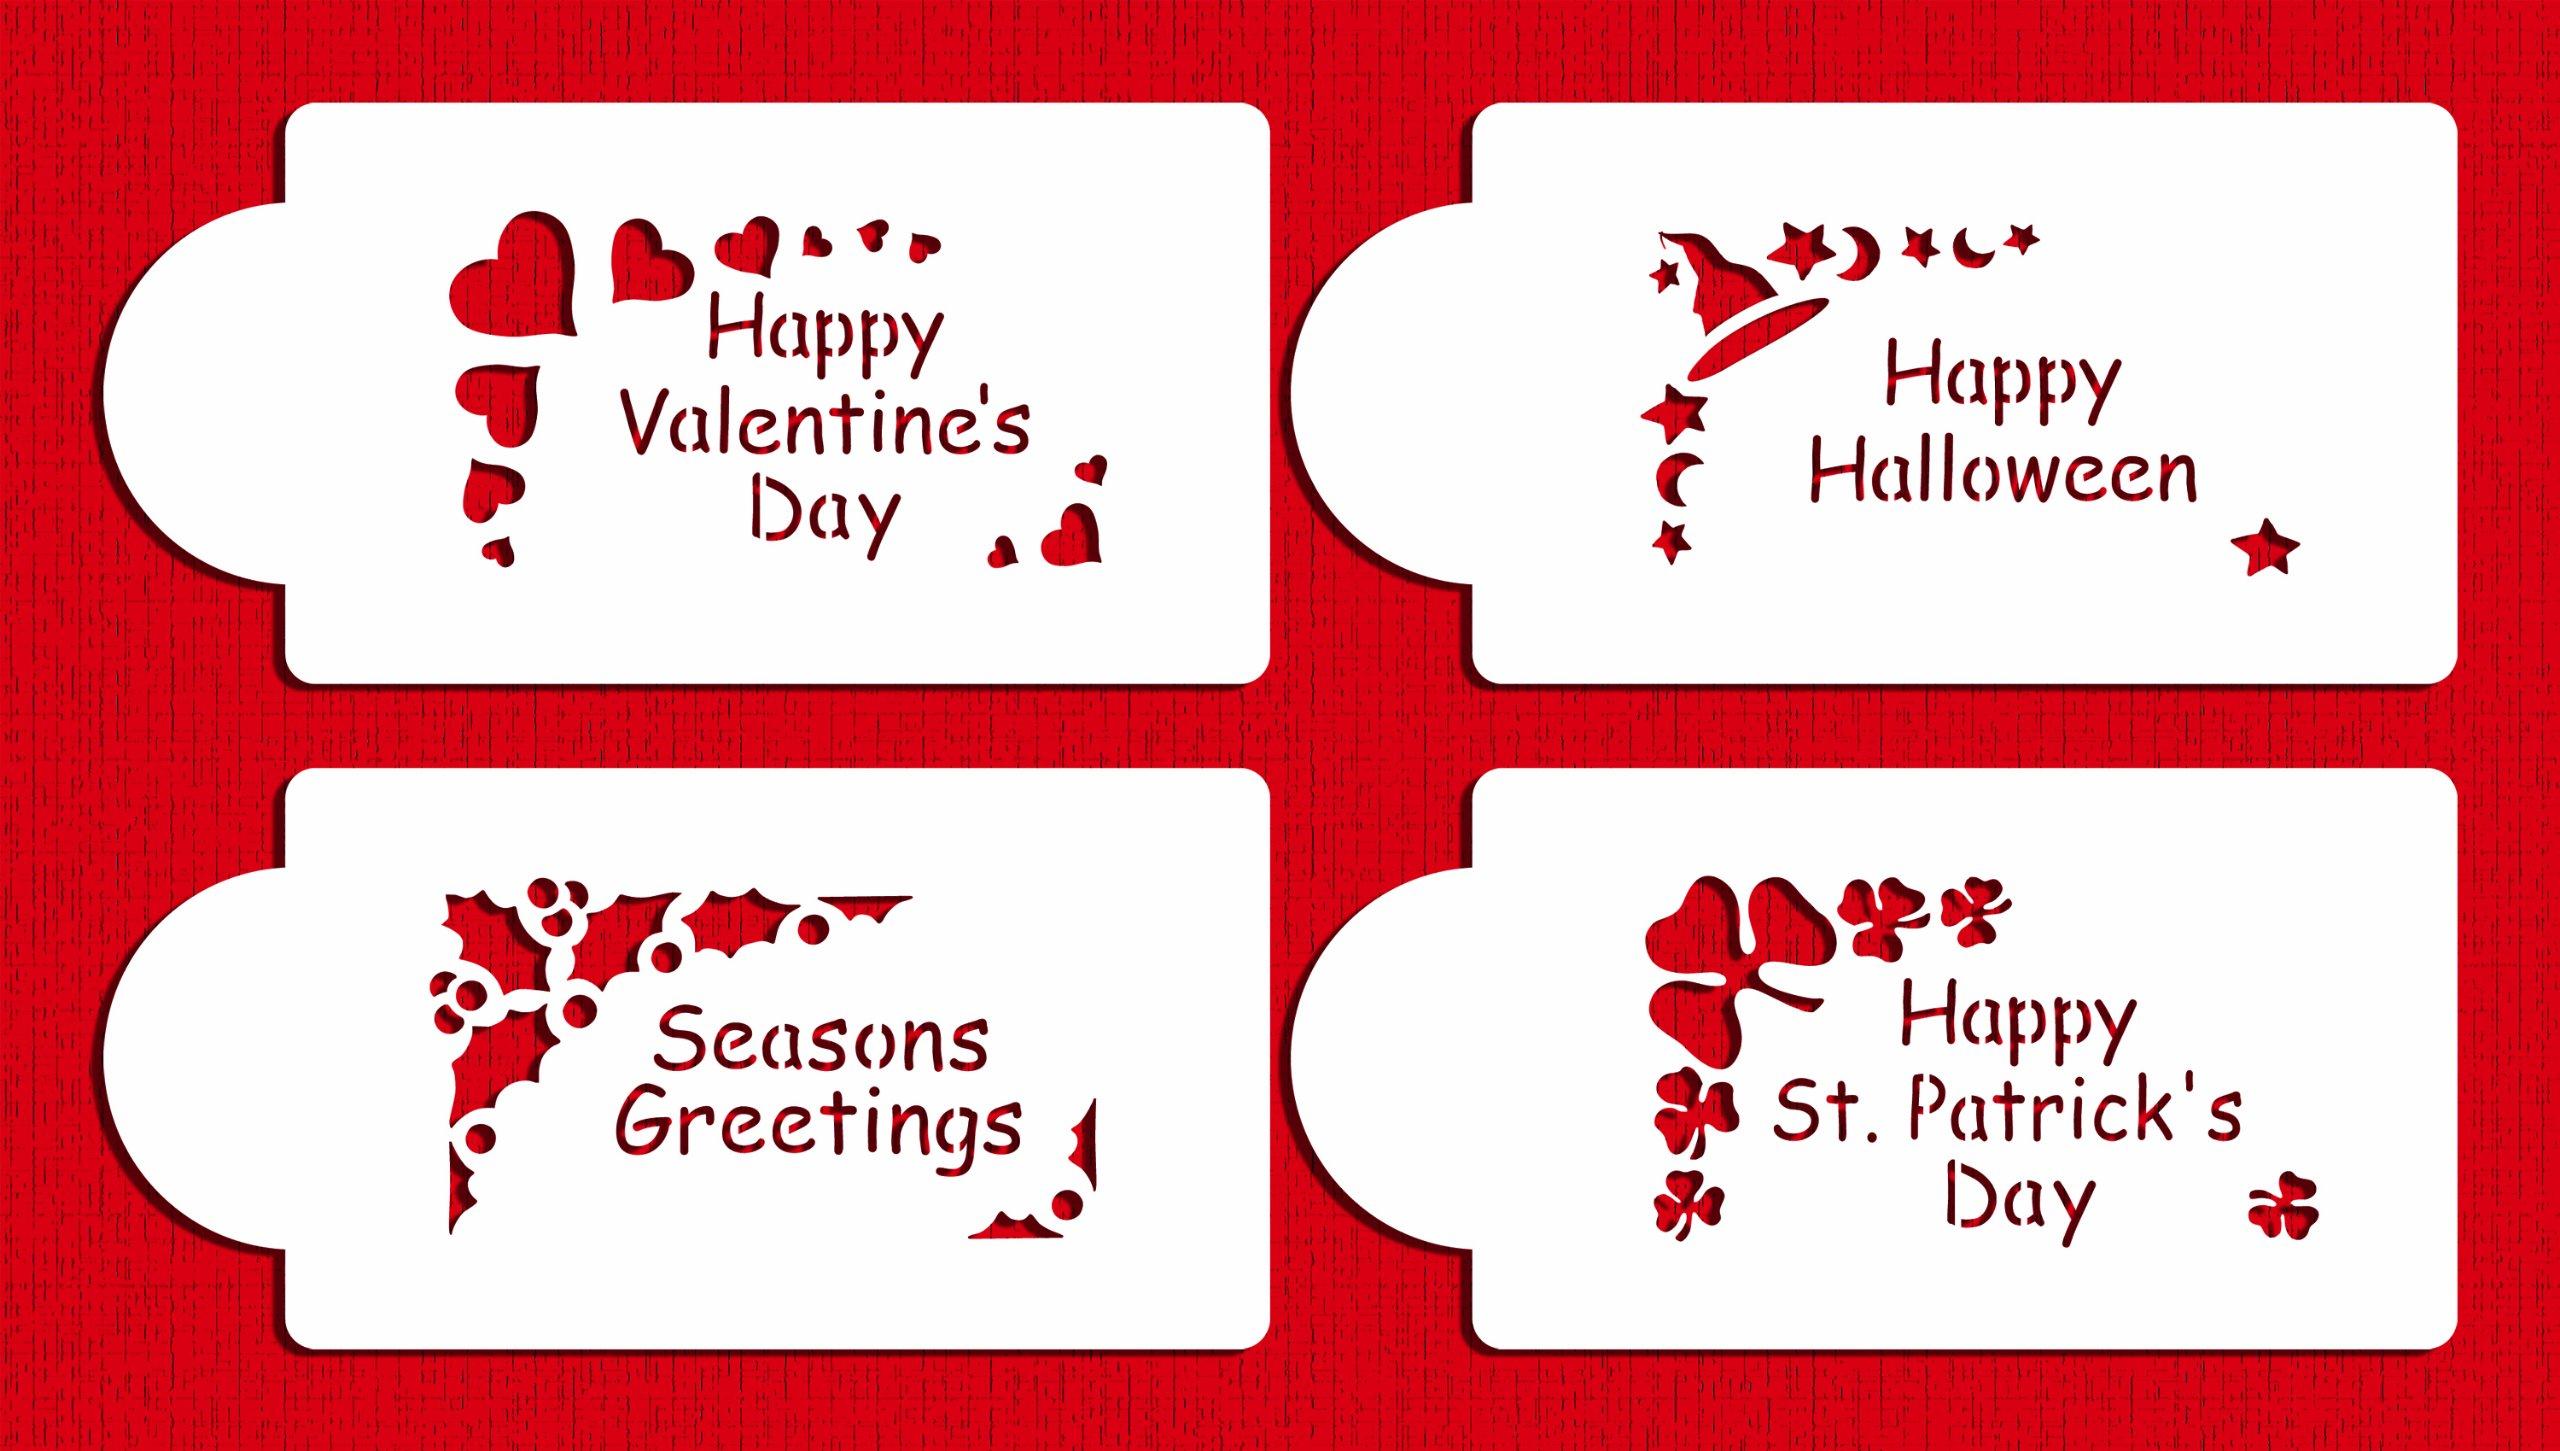 Designer Stencils C310 Holiday Corners Cookie Stencils, (Happy Valentine's Day, Happy Halloween, Happy St Patrick' Day, Seasons Greetings), Beige/semi-transparent